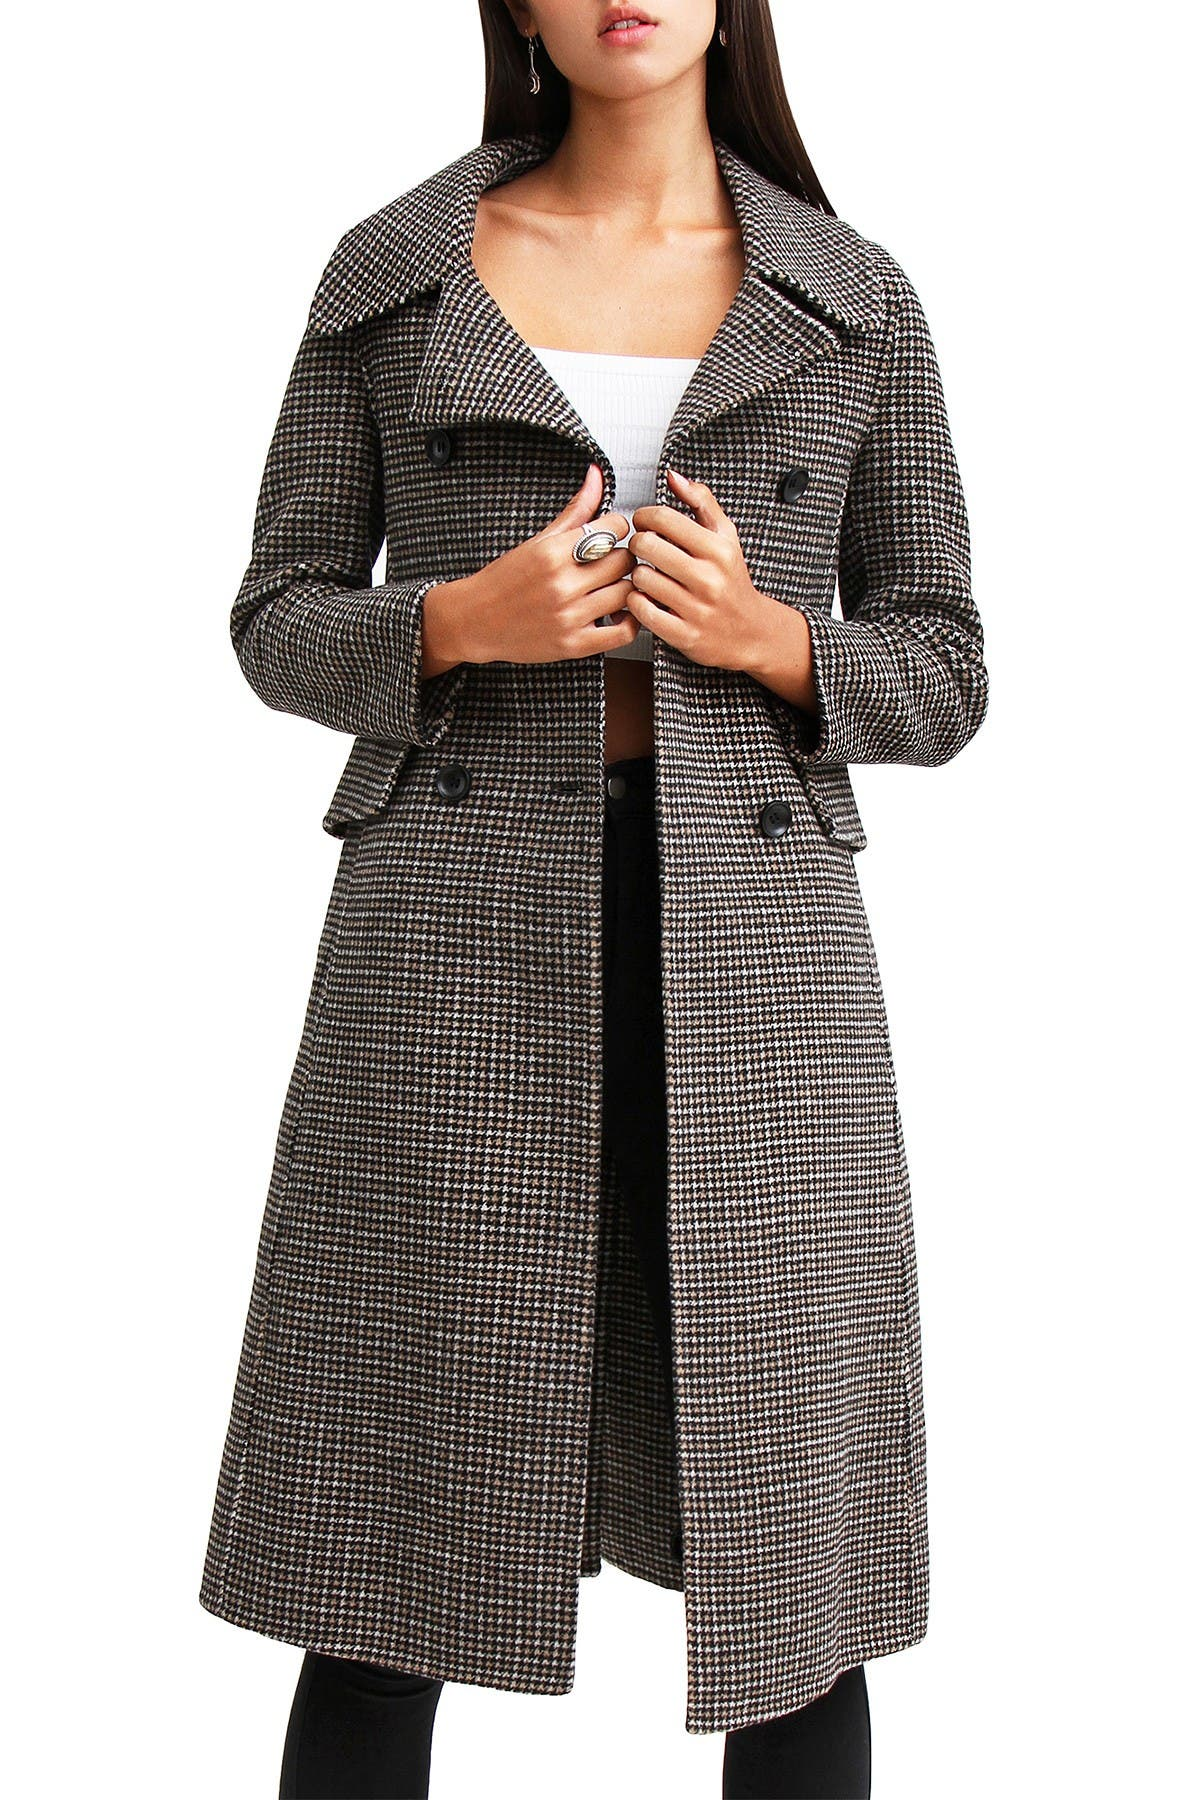 Womens Coat Wool Fitted Coat Paisley Print Winter Coat Bohemian M Size Wool Jacket Dark OrangeBrick and Navy Boho Wool Jacket SIZE